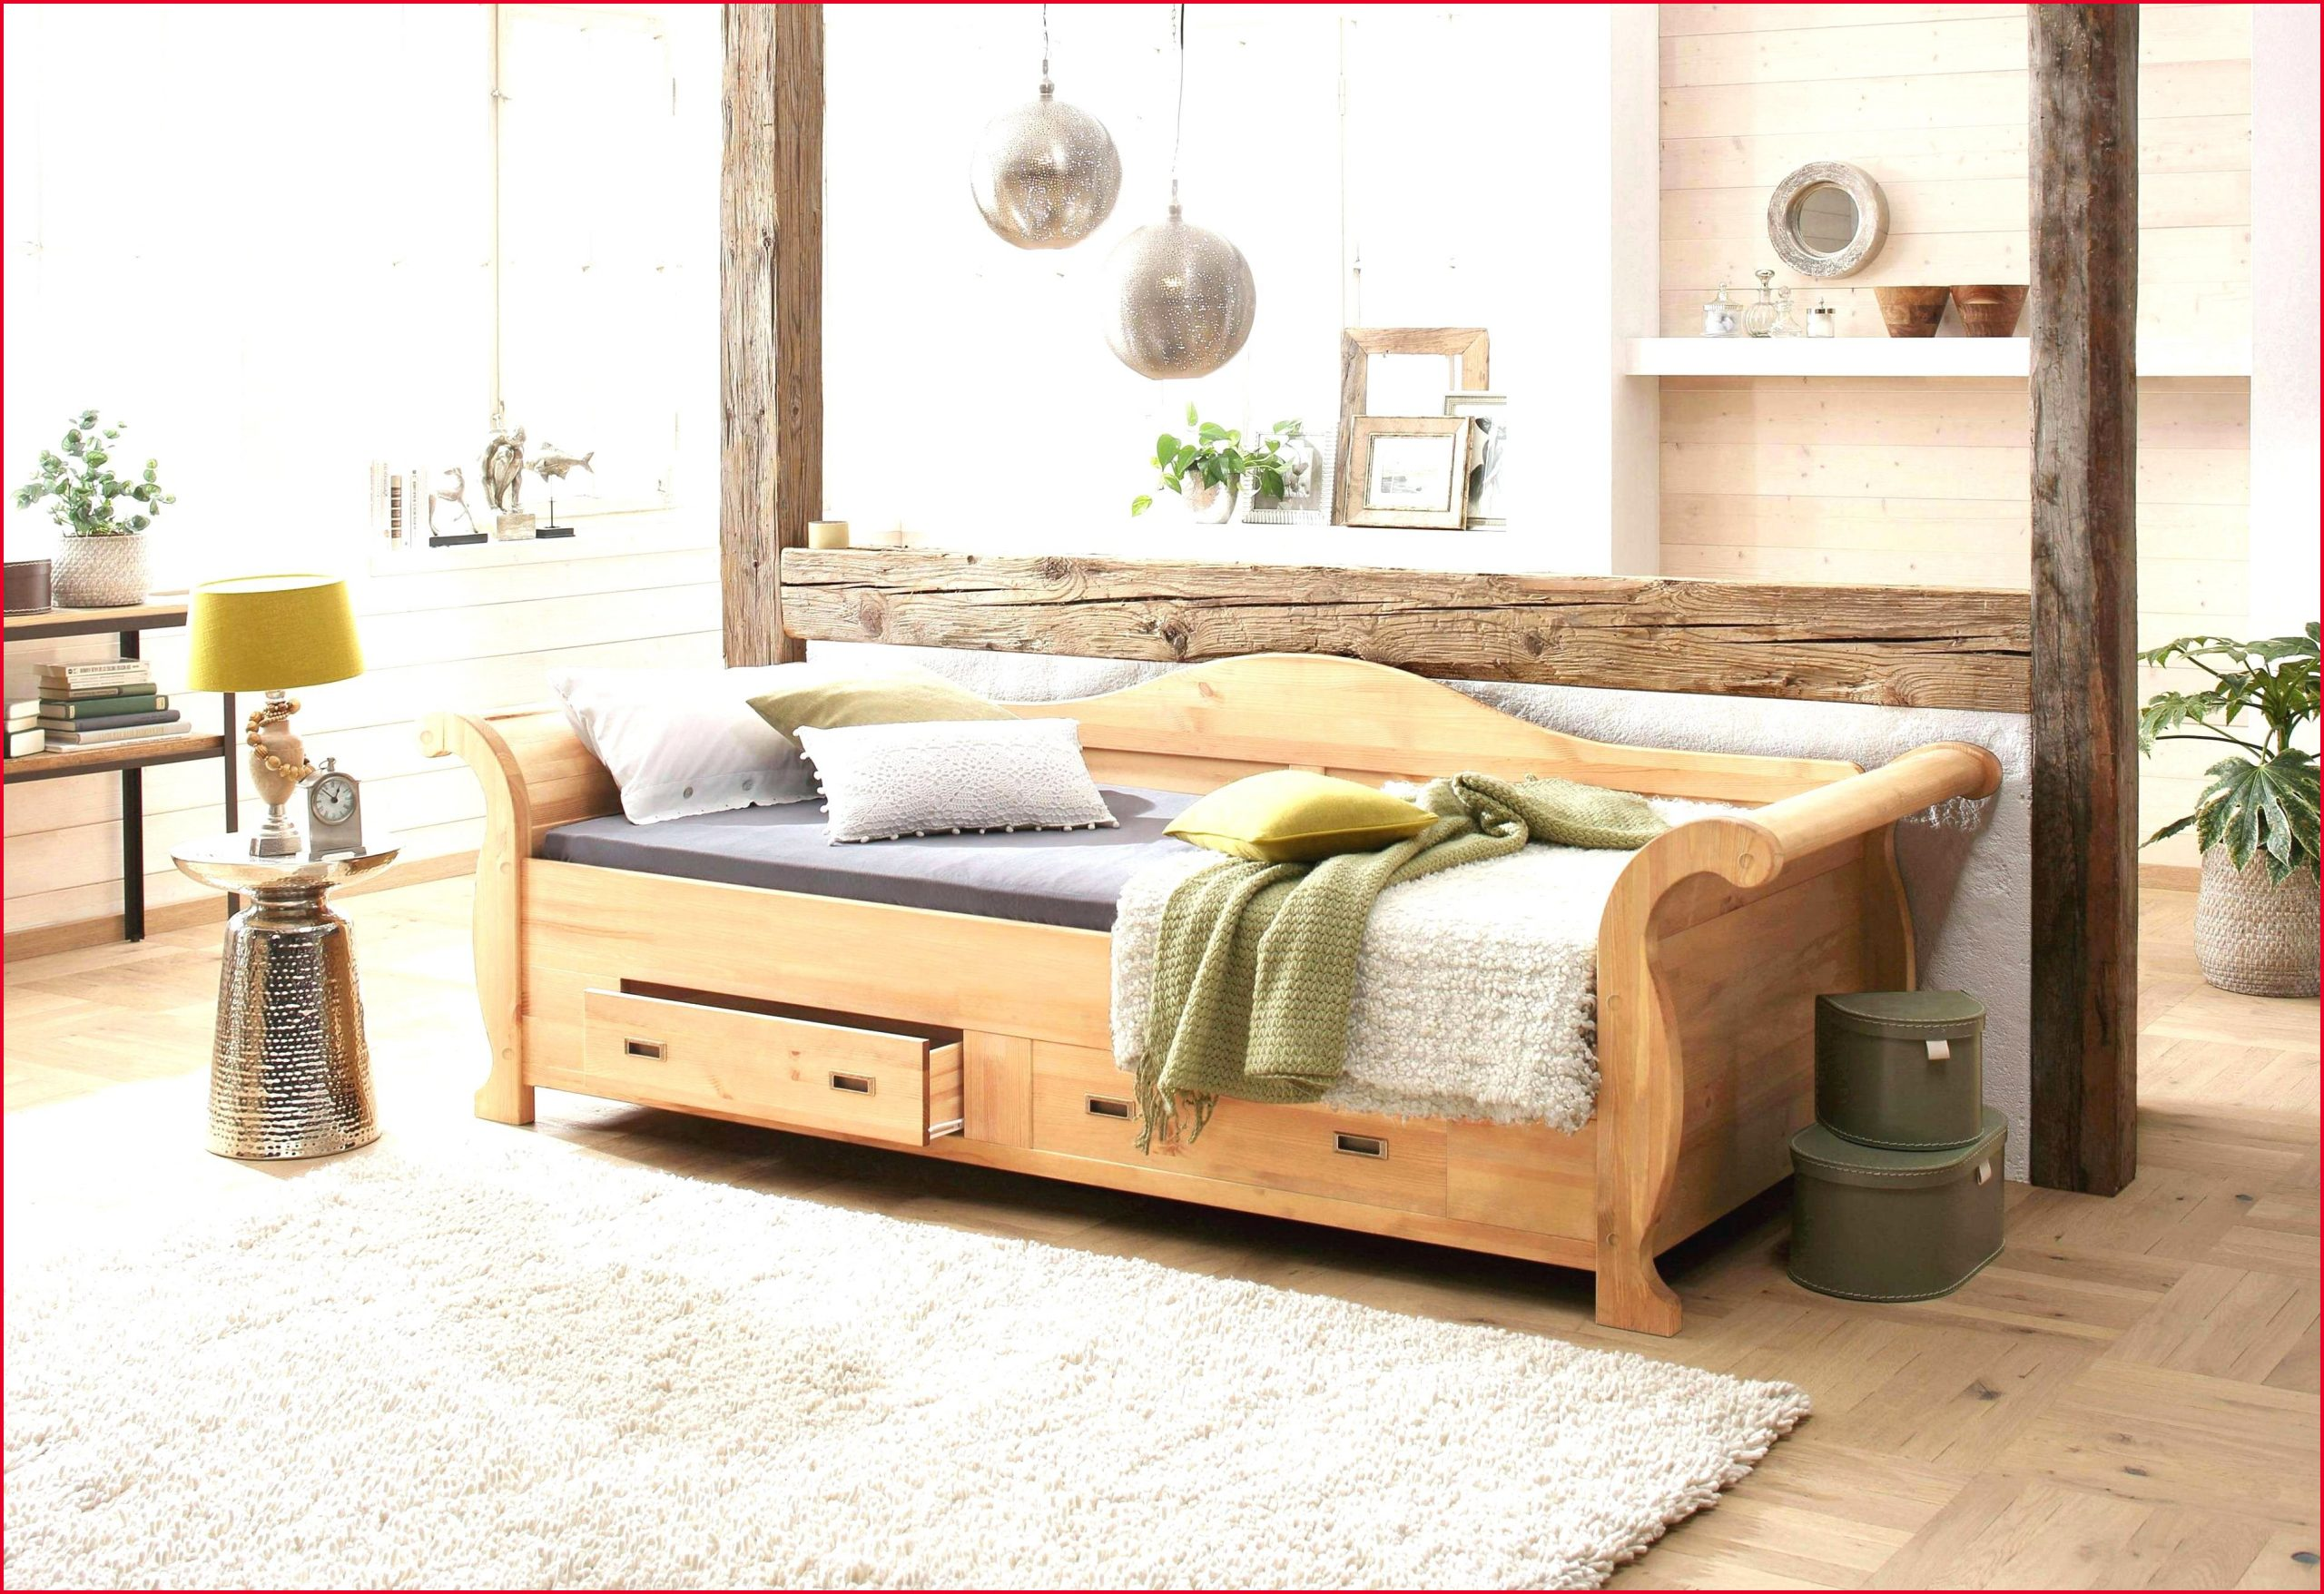 Full Size of Ausklappbares Bett Sofa Ikea Ausklappbar Zum Ausklappen Mit Stauraum Doppelbett 180x200 Klappbar 41 2c Fhrung 140x200 Ruf Betten Preise Lattenrost Komplett Bett Bett Ausklappbar